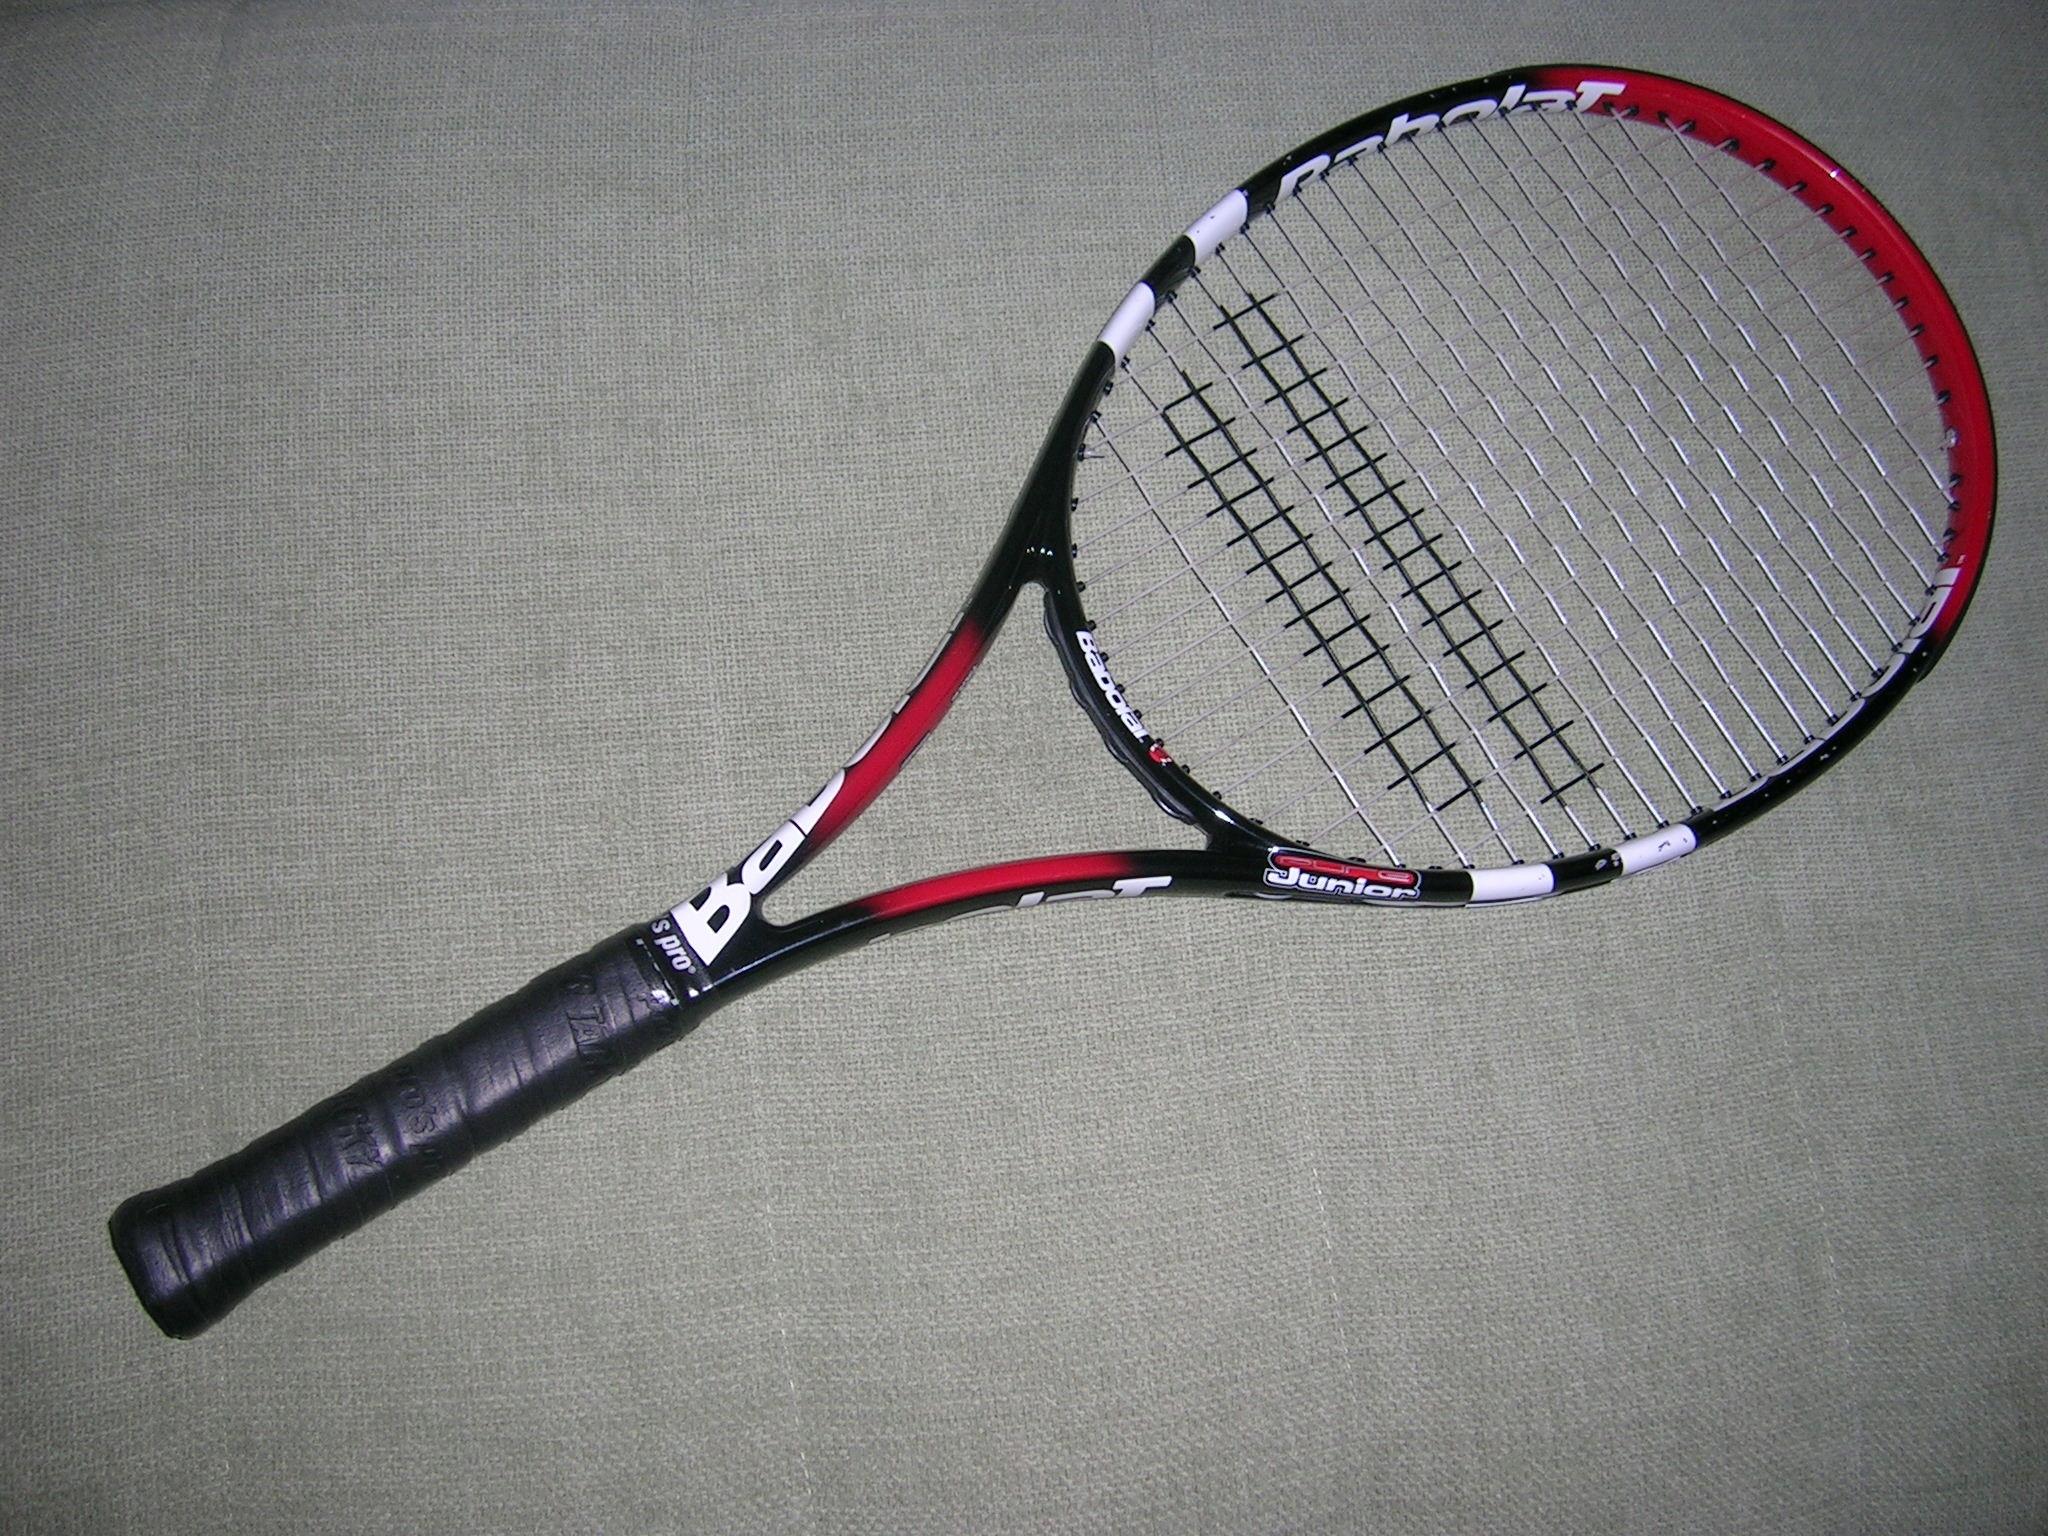 Rakieta tenisowa BABOLAT PURE JUNIOR L0